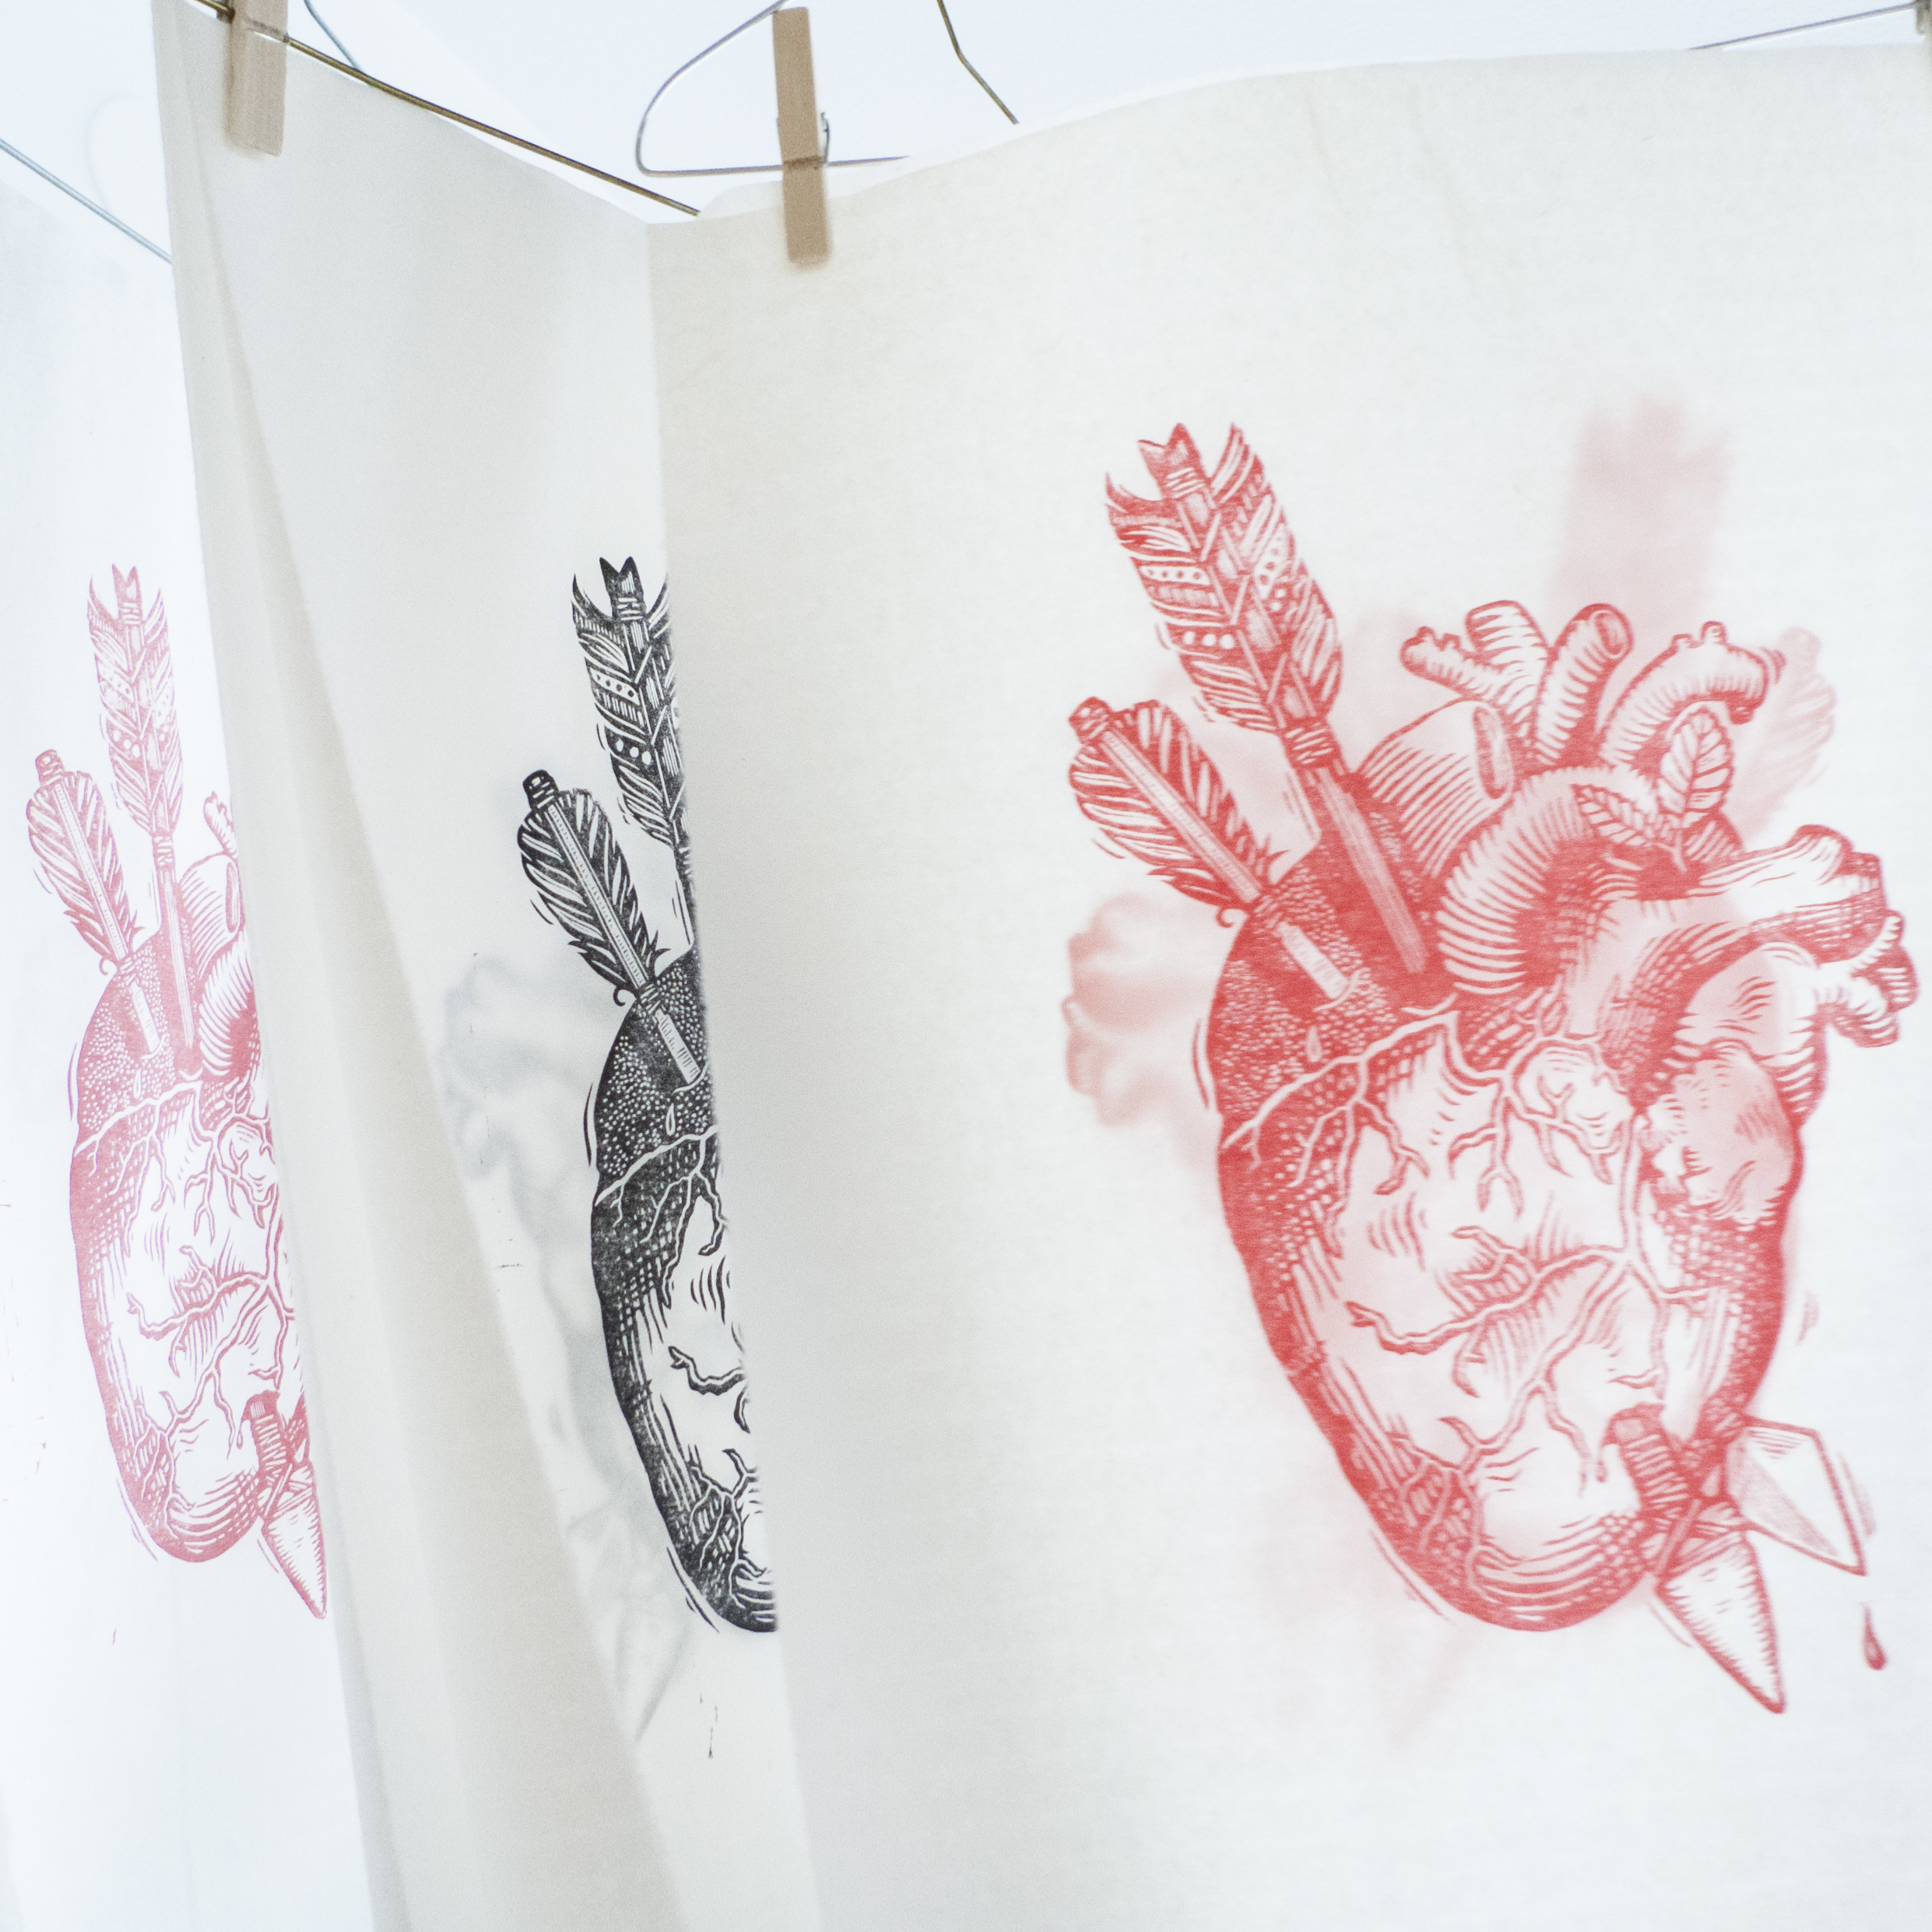 Kärlek-love-anatomical-heart-linocut-e-hanging.jpg